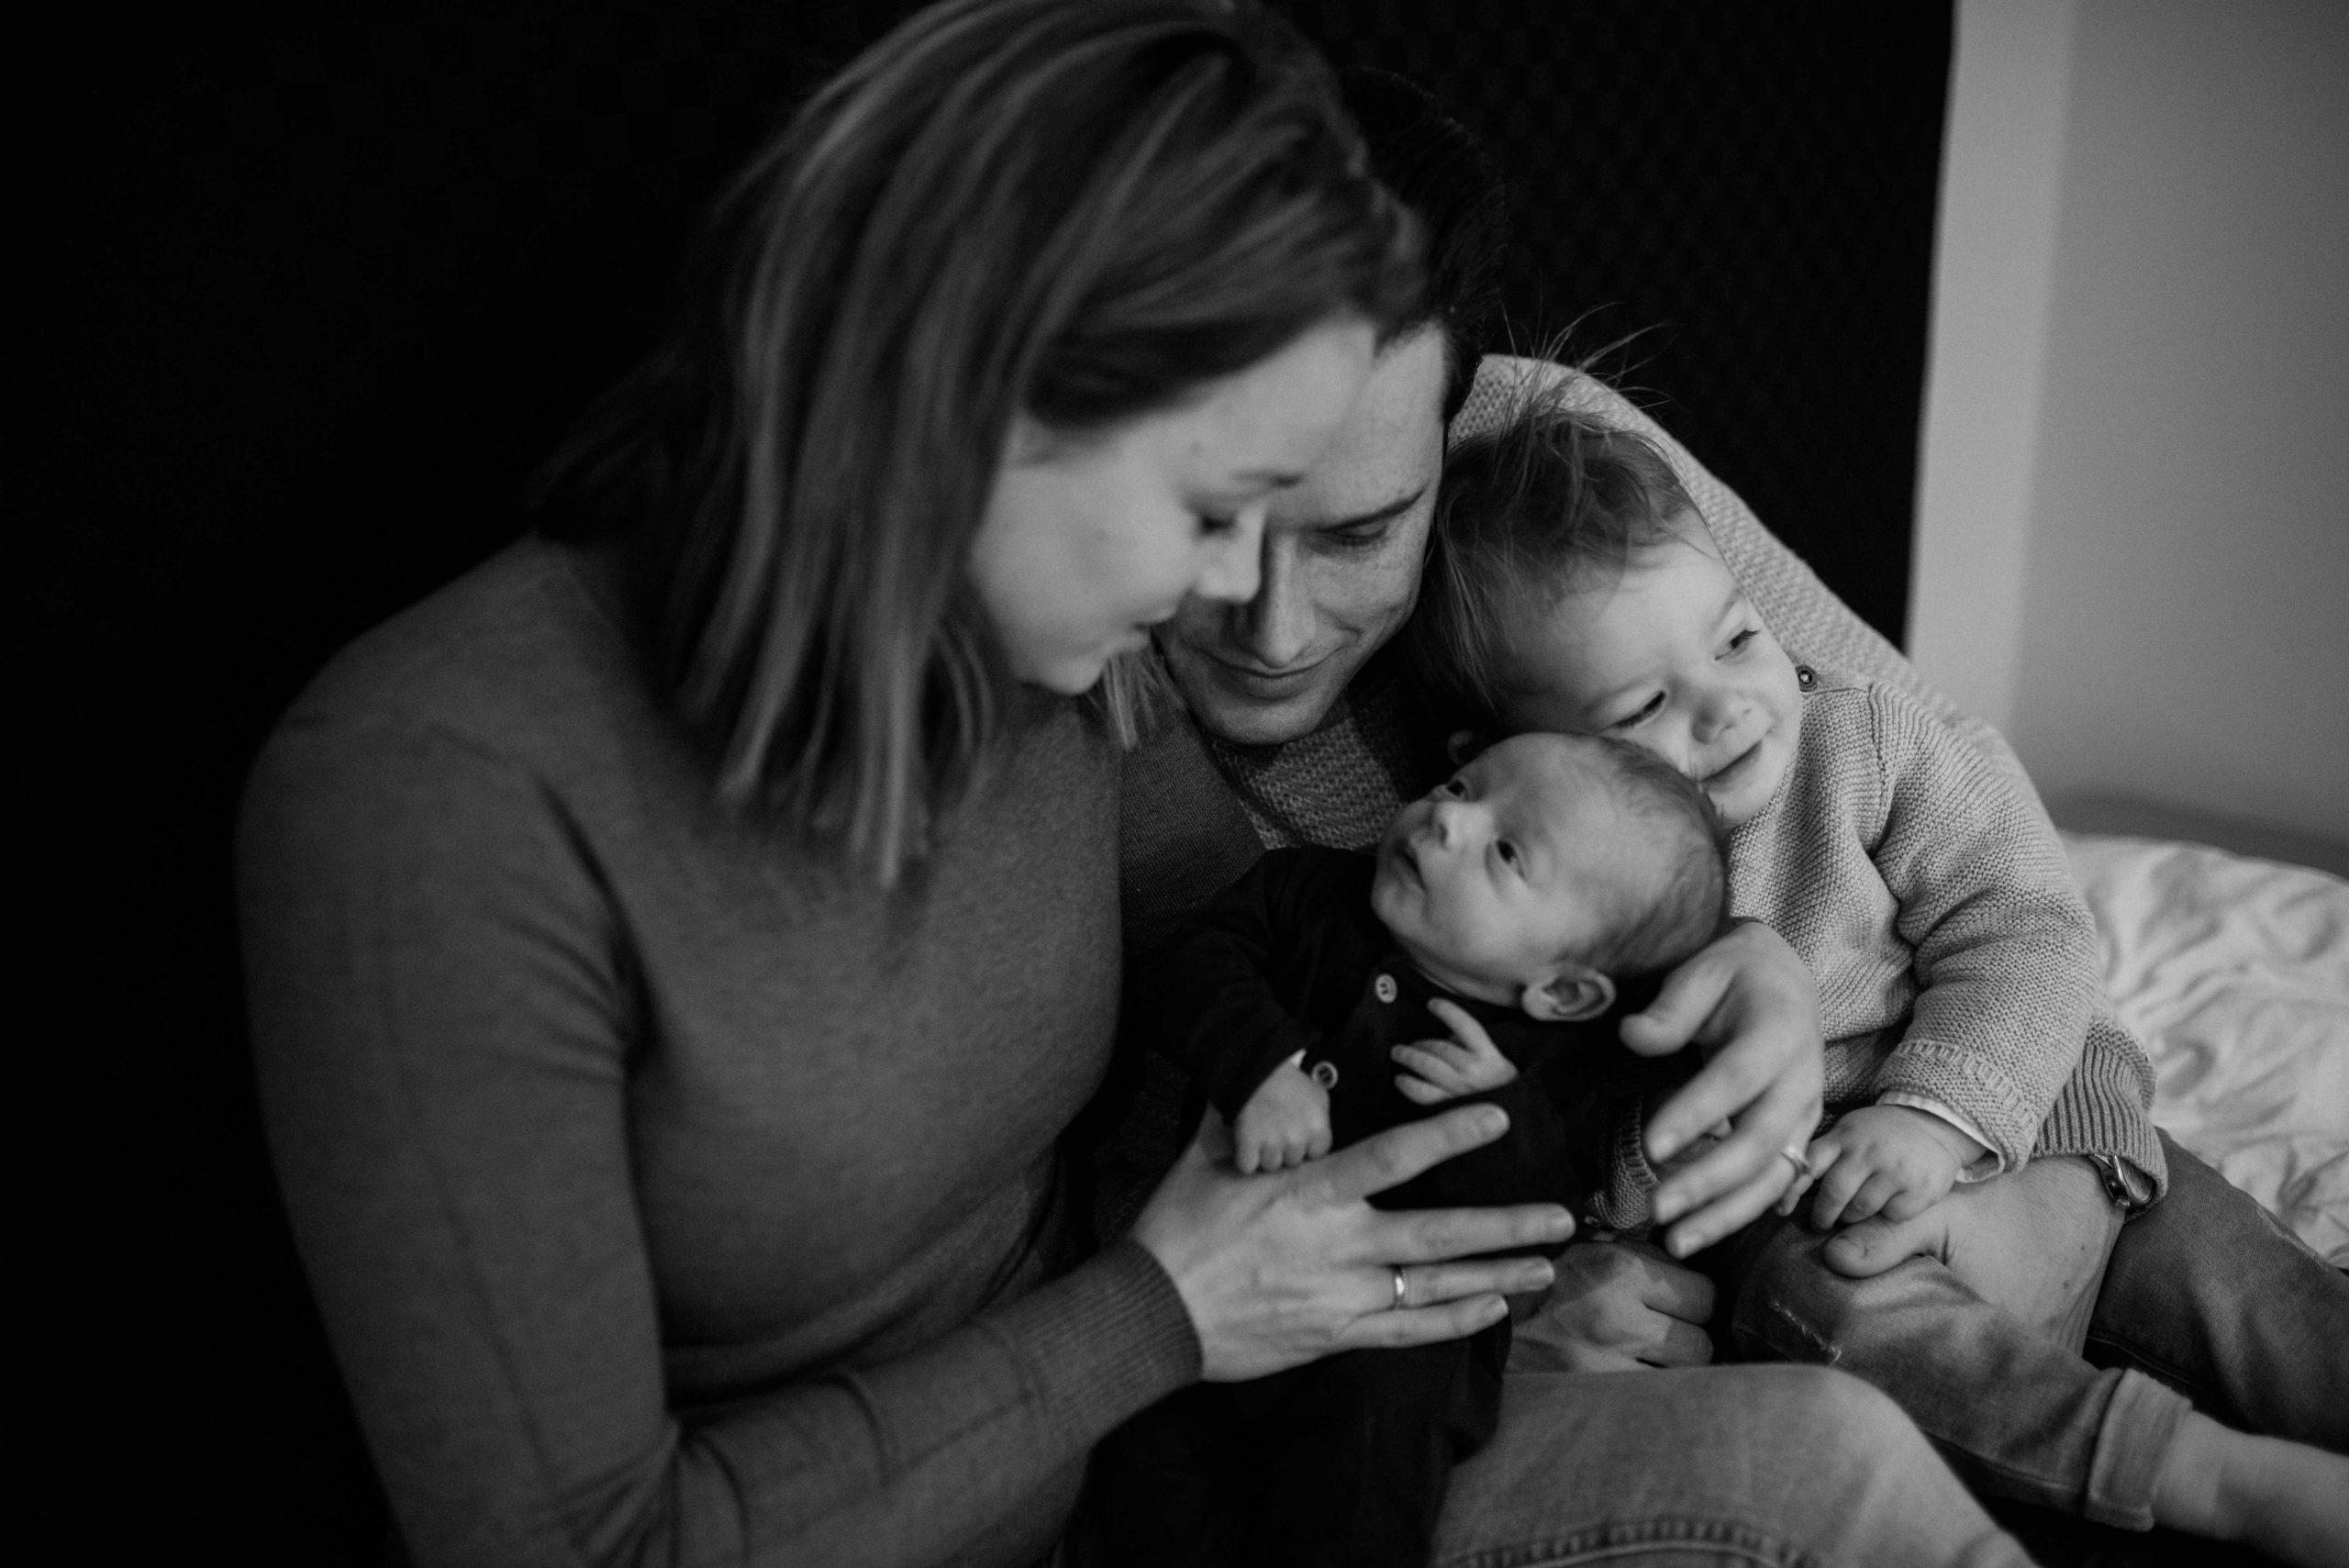 newborn baby familie fotograaf bureaucocoon Nederland Limburg zoon dochter broer zus papa mama zwangerschap babybuik